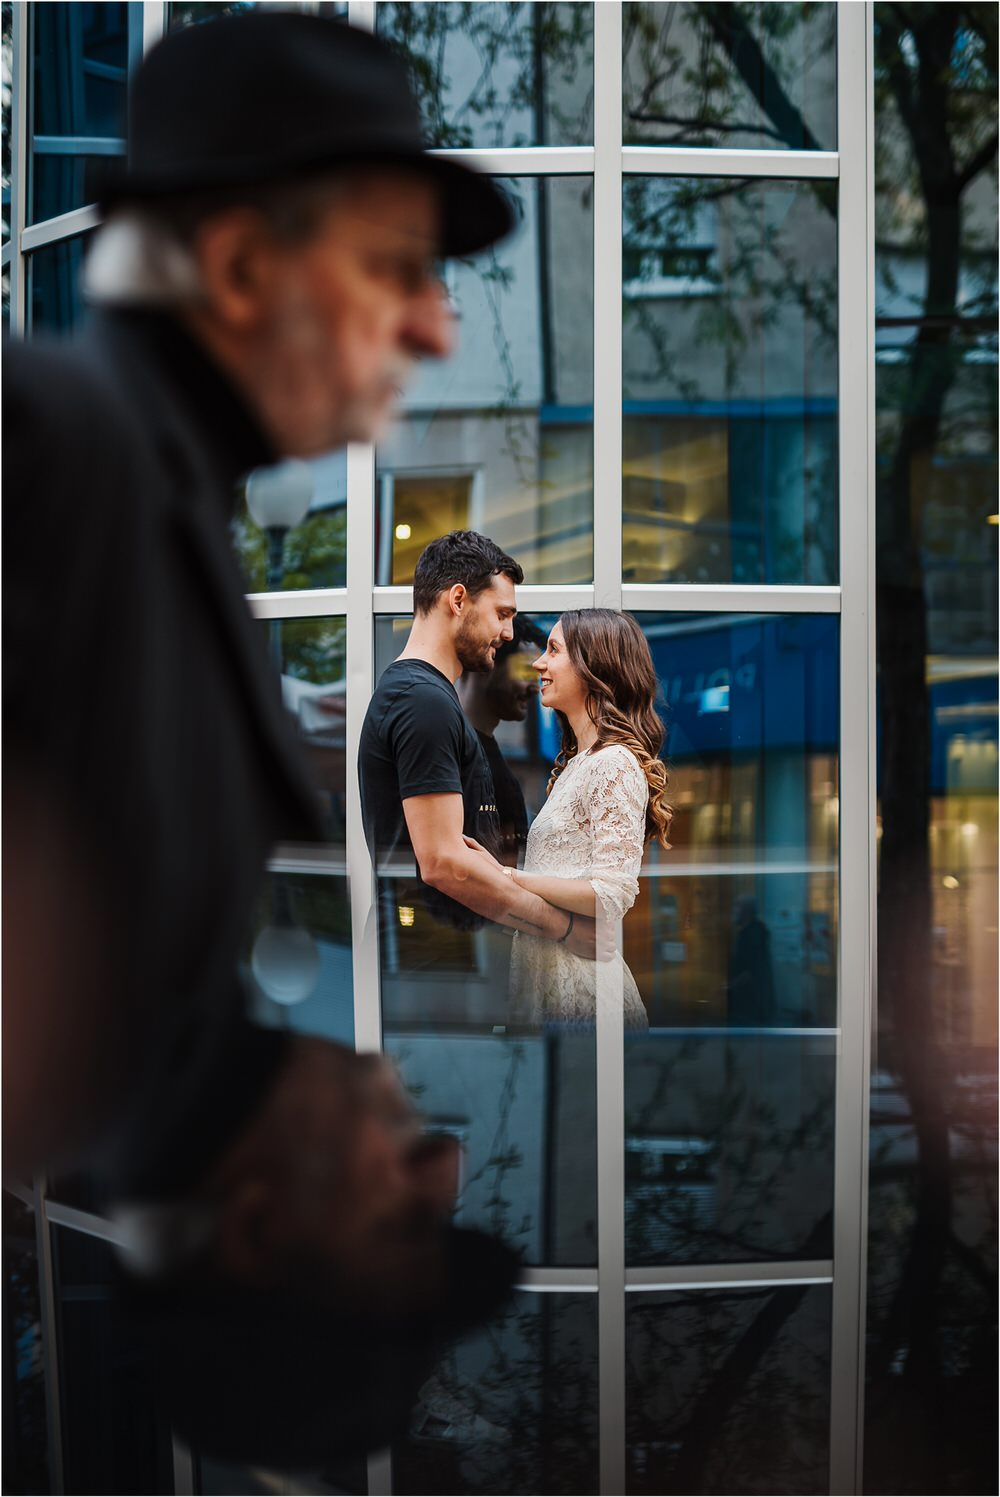 zagreb wedding poroka vjencanje vencanje fotograf photographer foto croatia hrvatska hrvaska zaroka engagement relaxed natural 0041.jpg